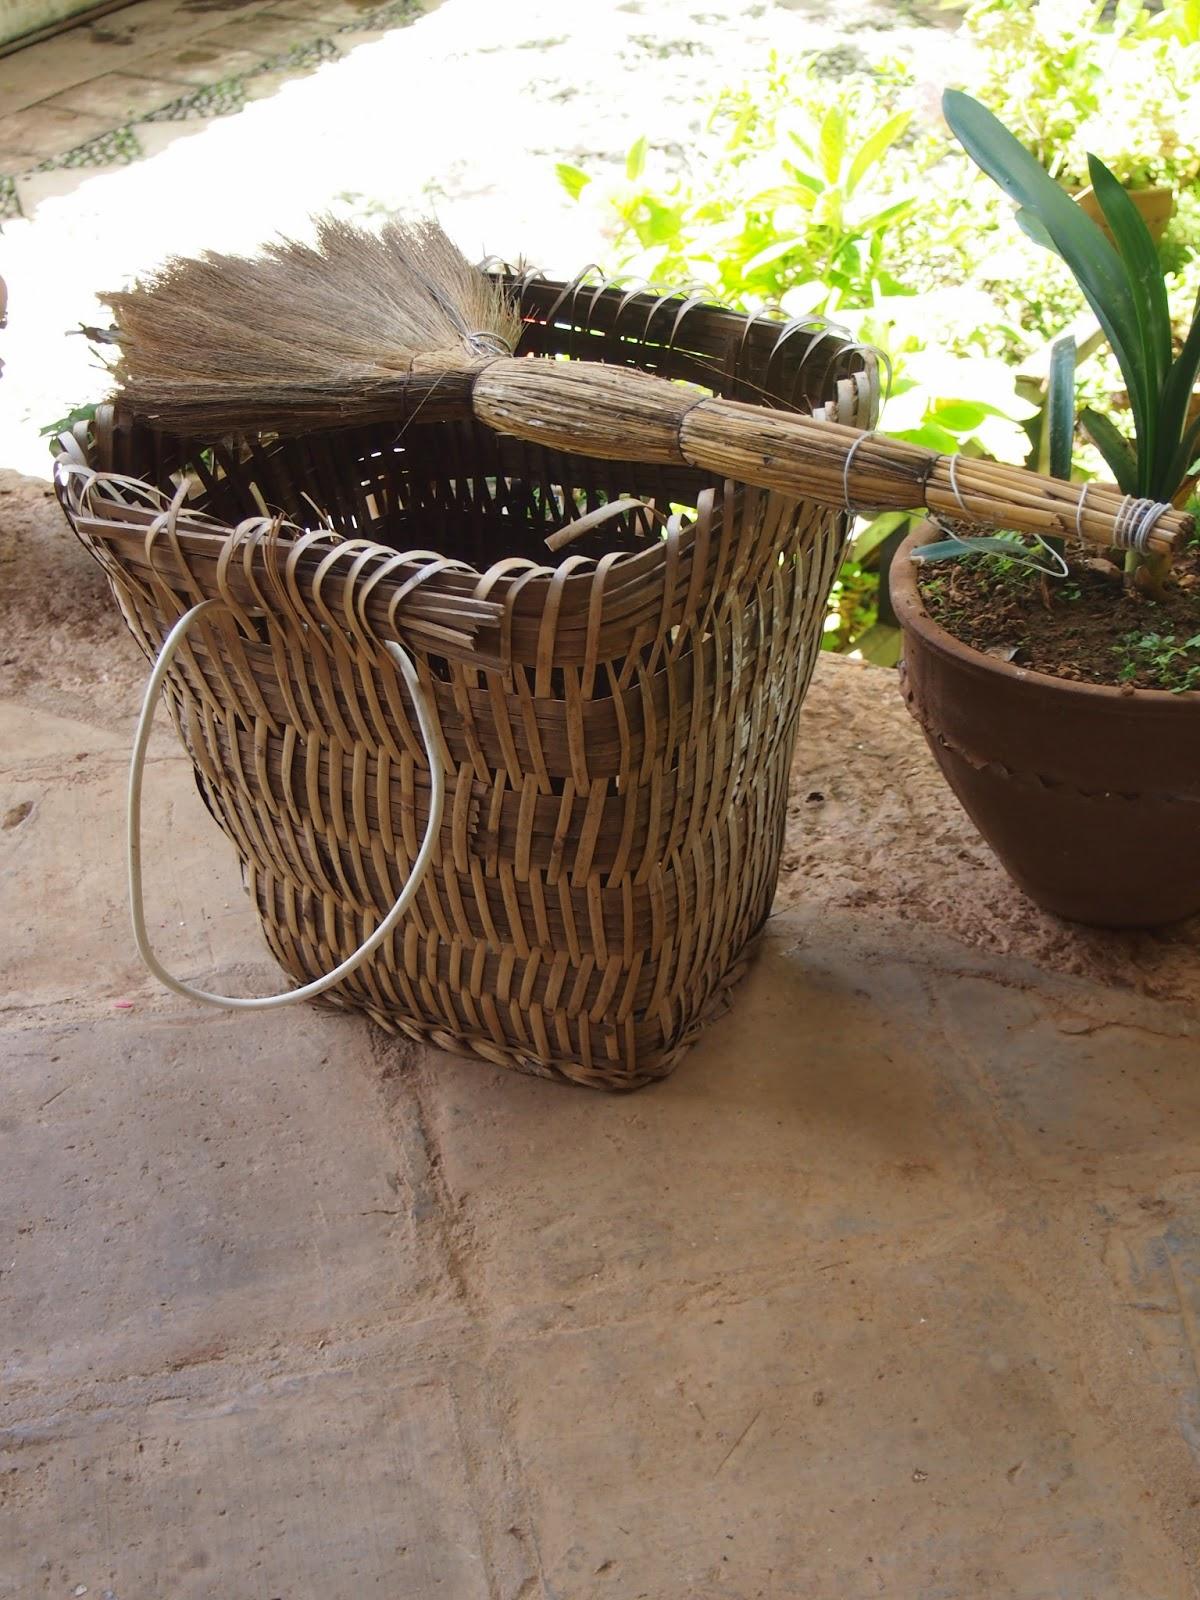 a broom and basket